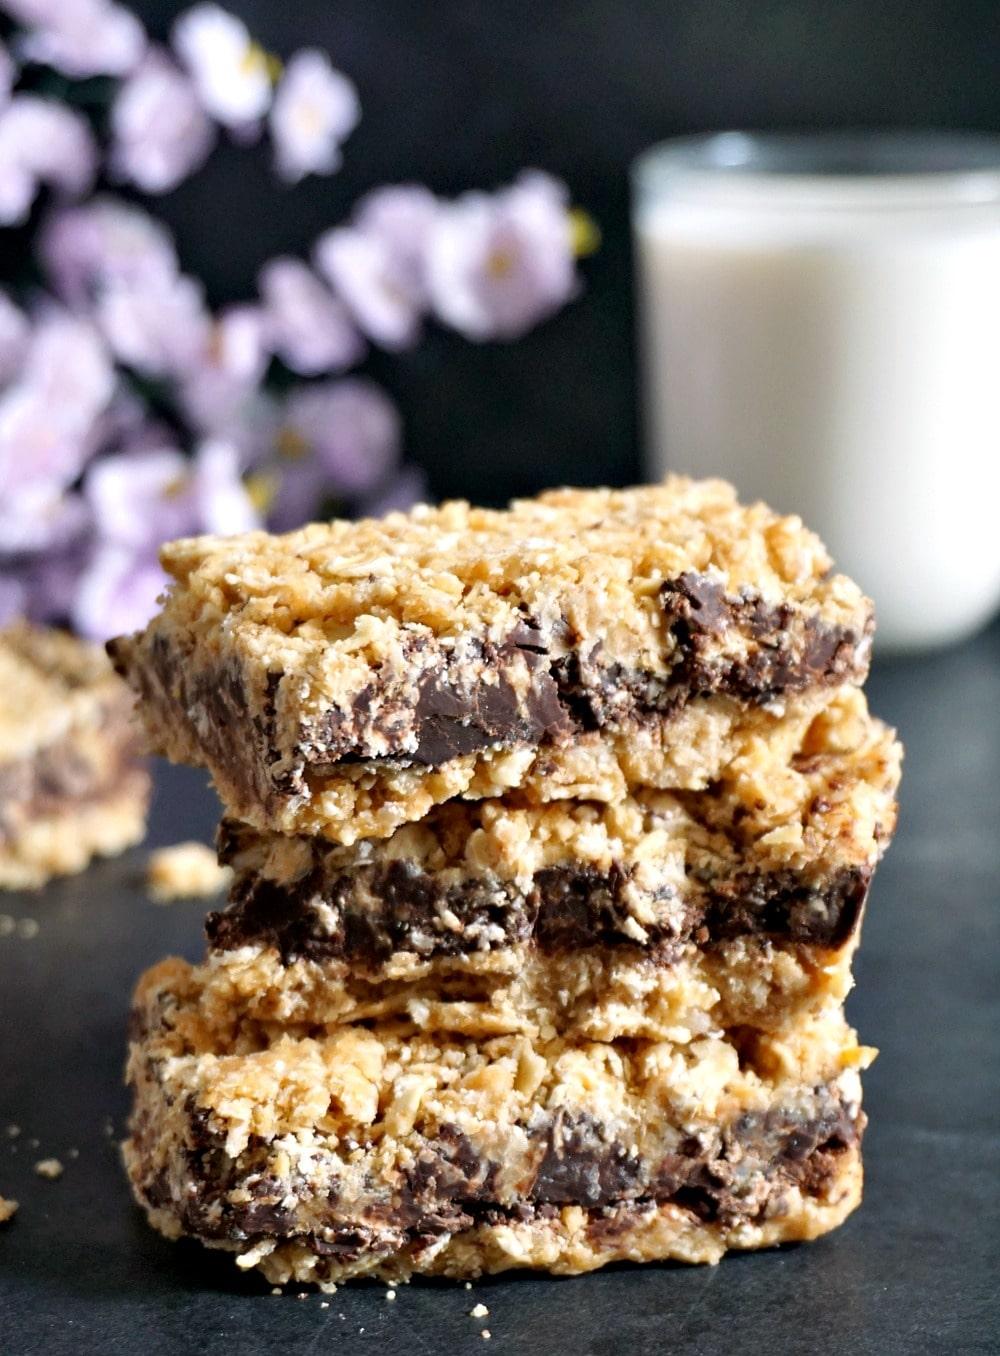 Healthy no-bake chocolate oat bars